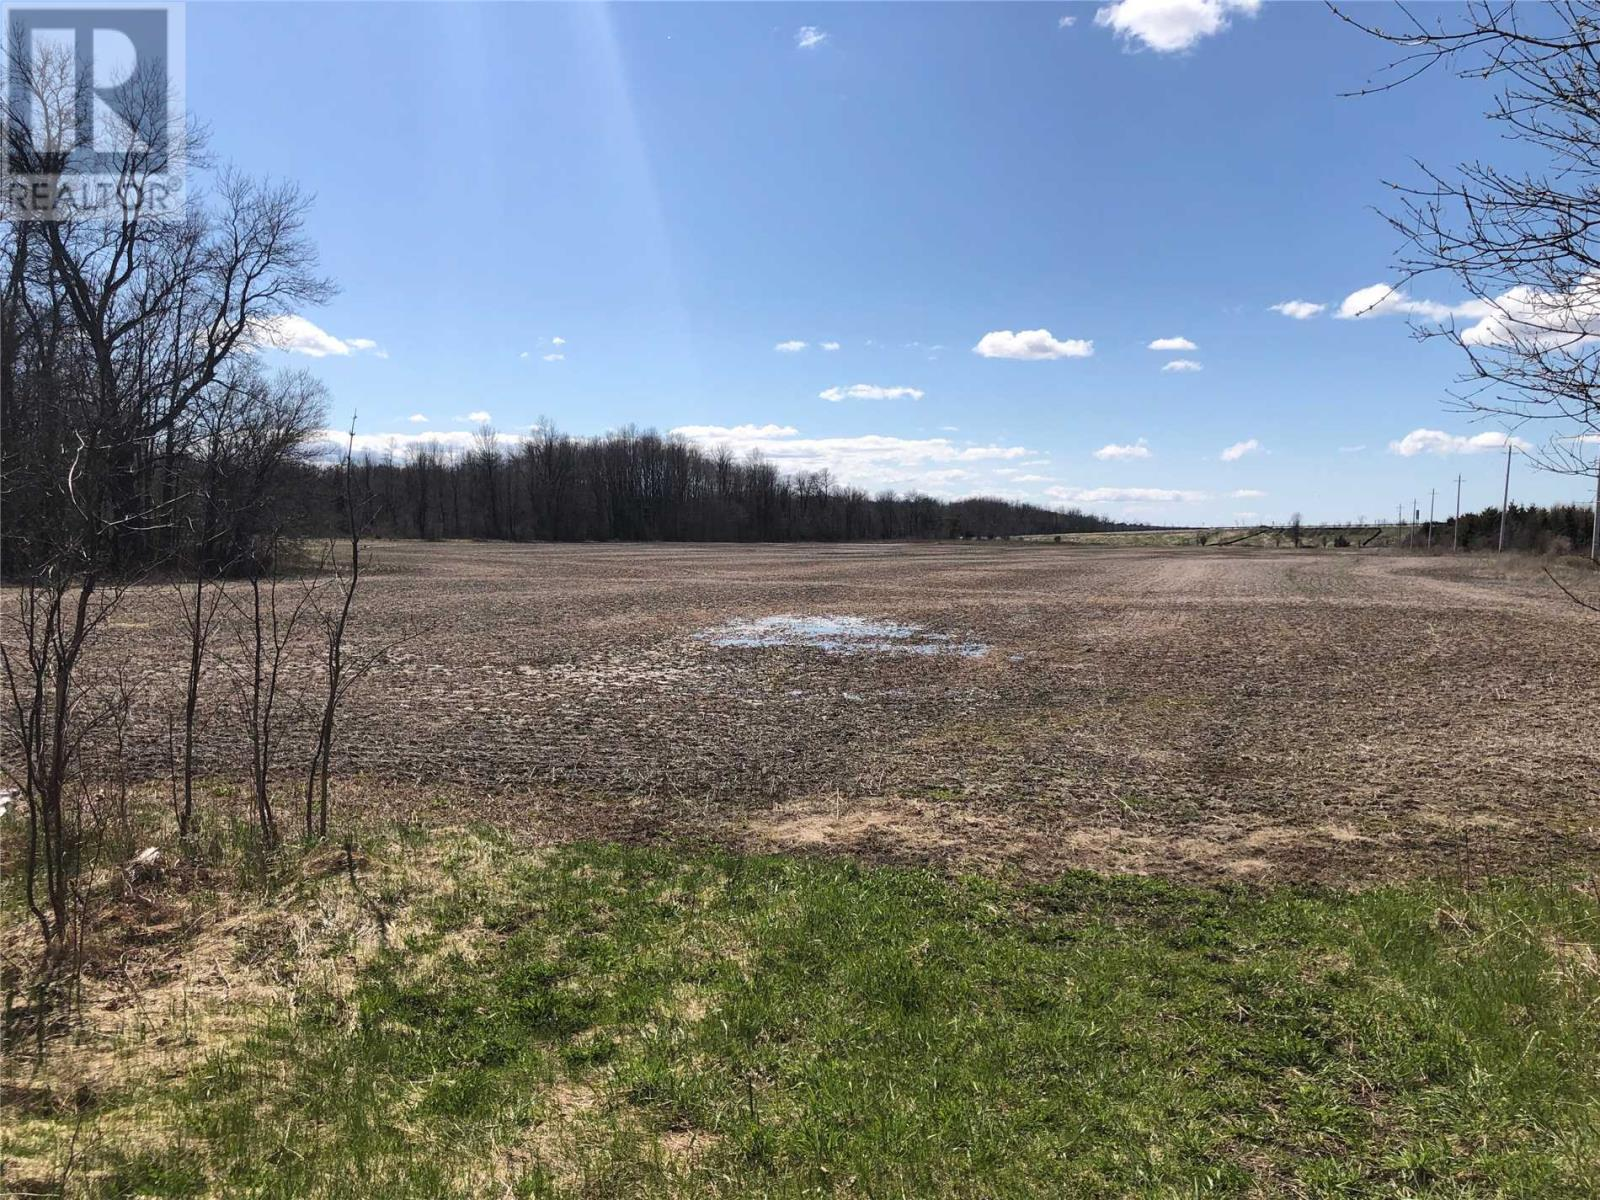 476 Penetanguishene Rd, Springwater, Ontario  L4M 4R9 - Photo 5 - S4439718